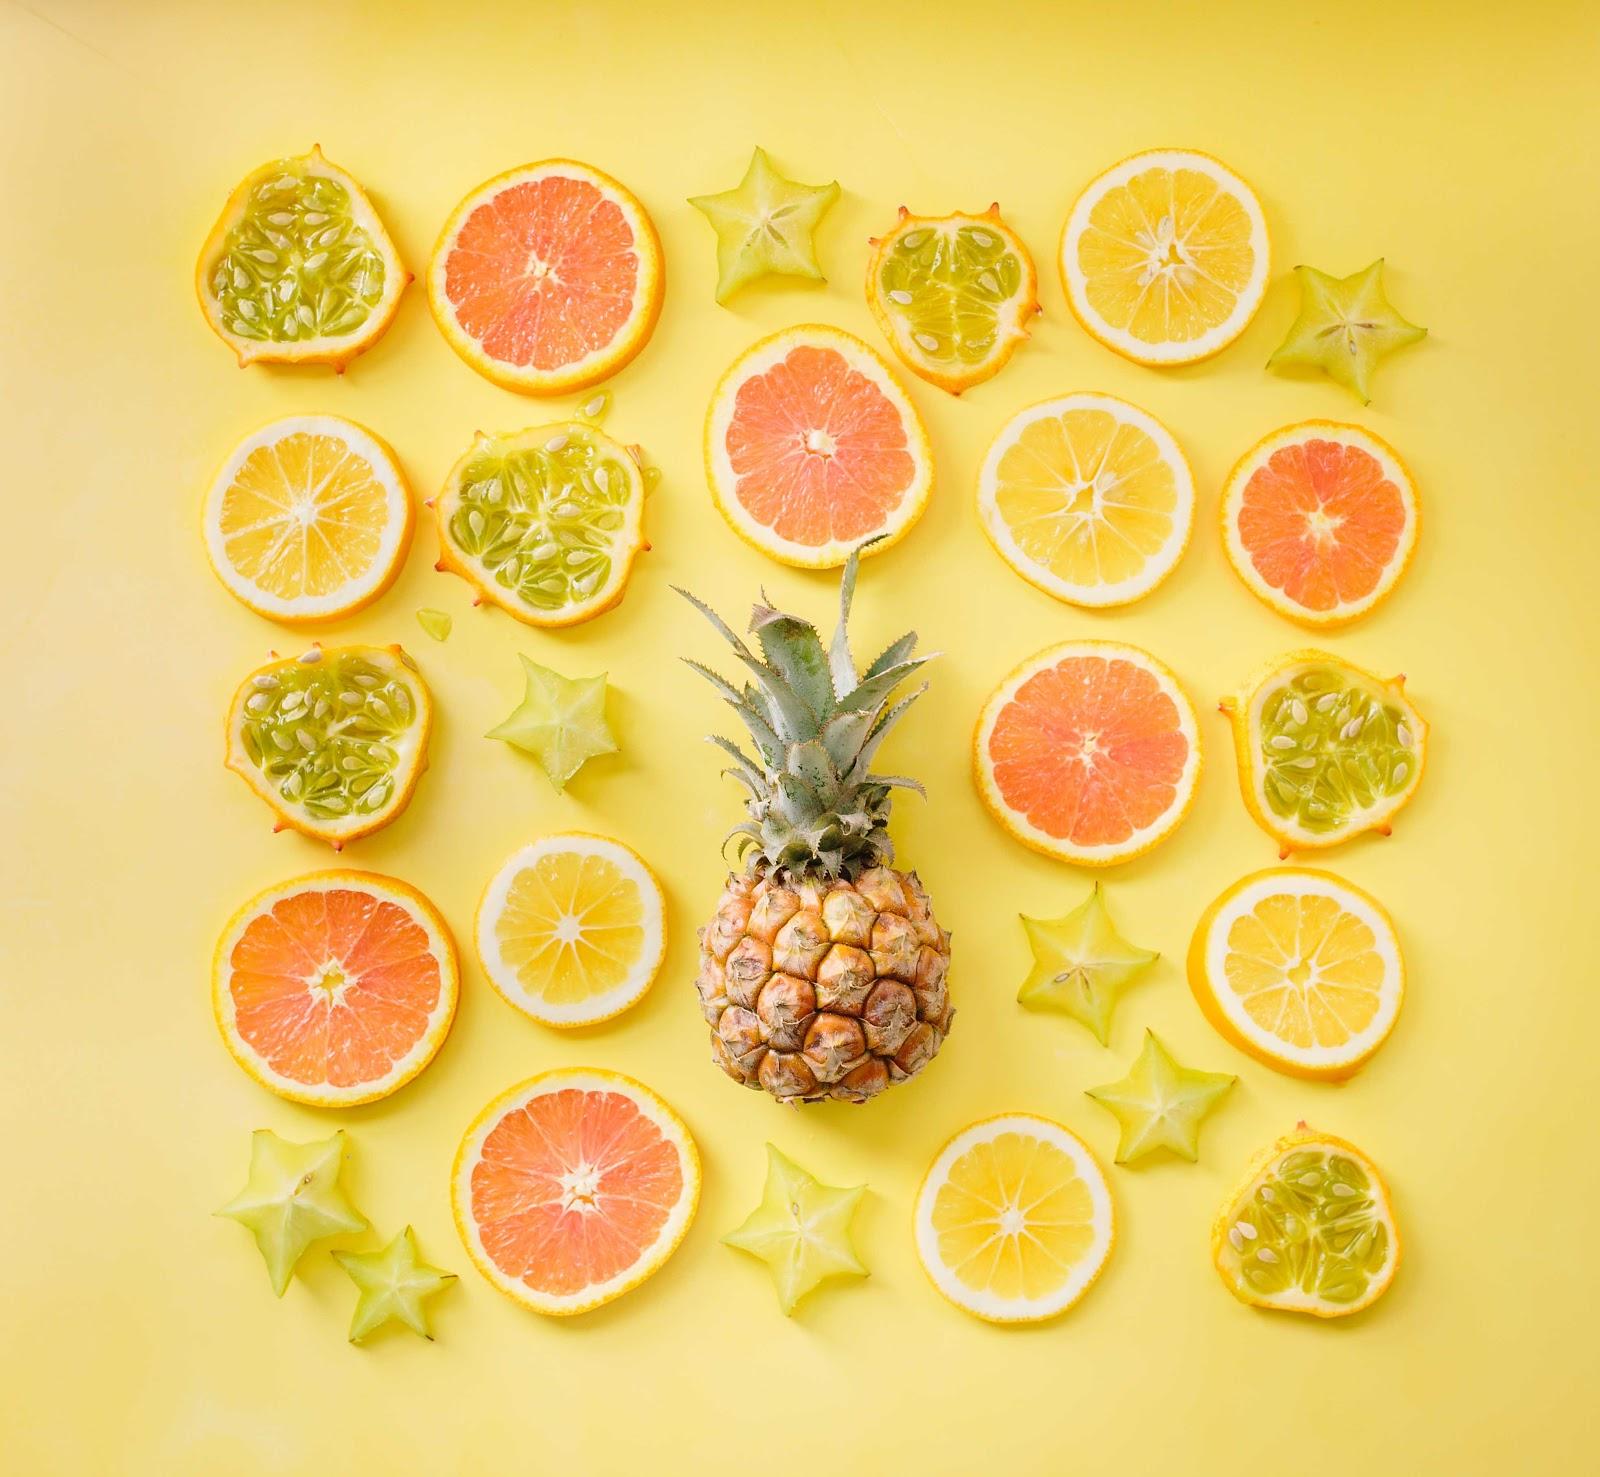 fruit juices in summer